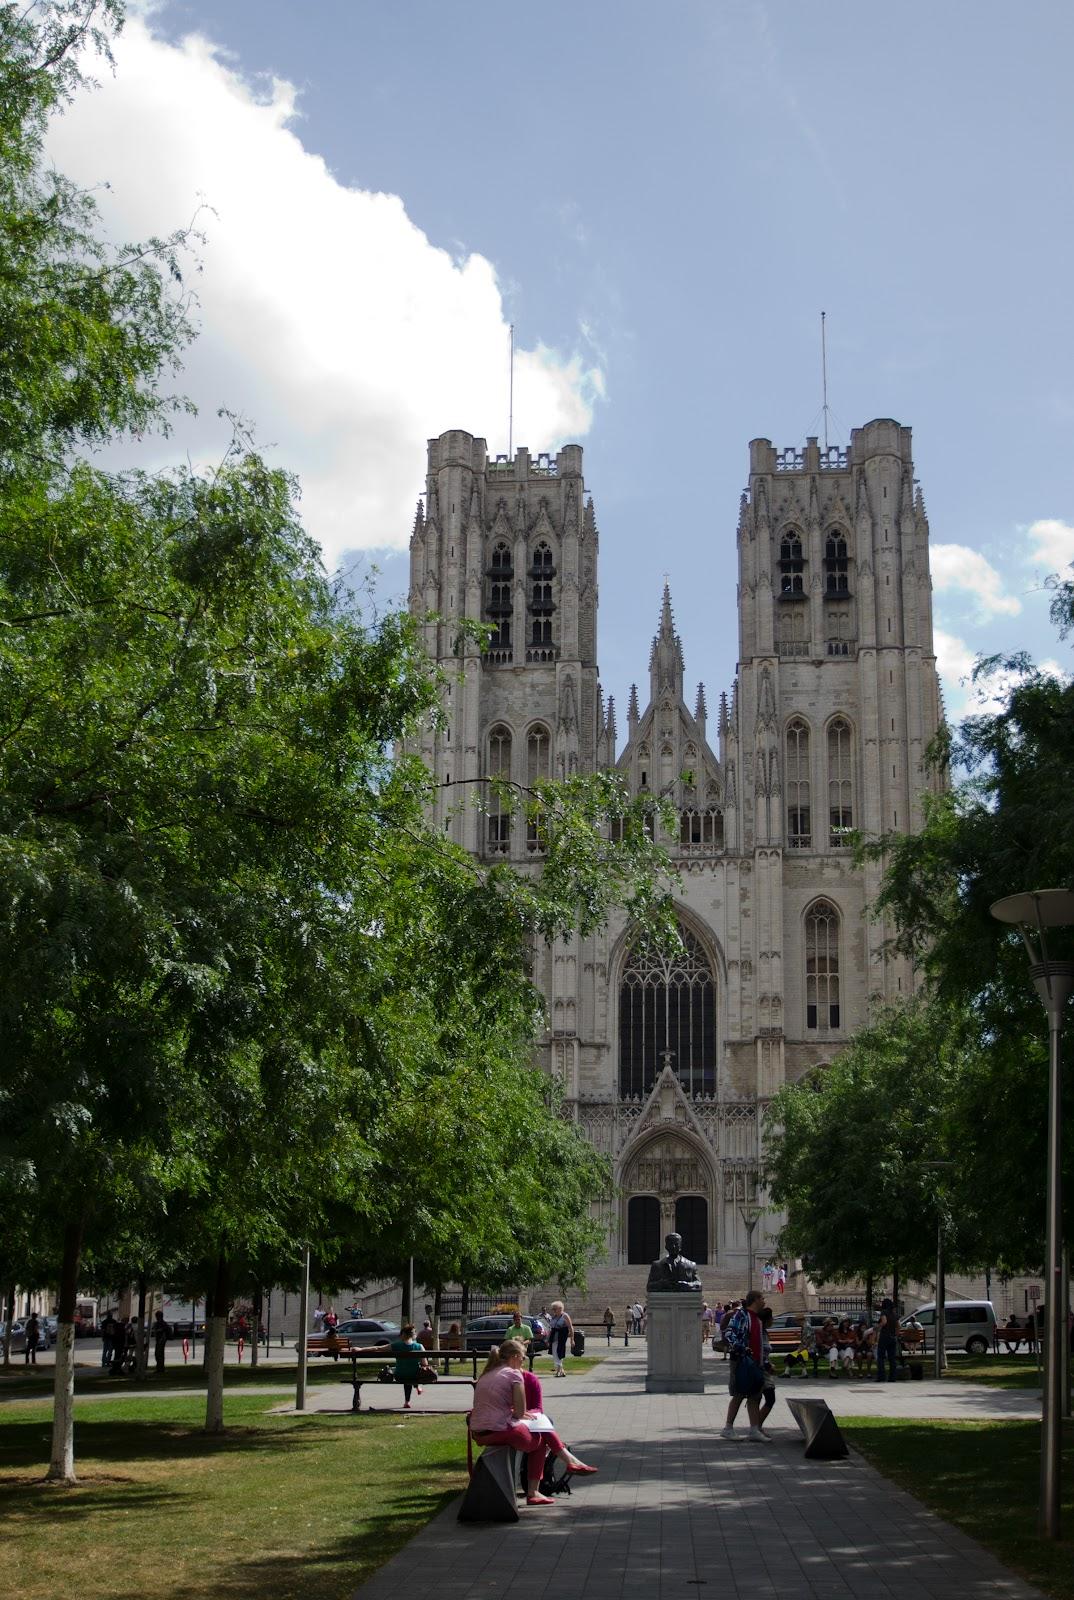 Catedrala Sfinților Mihail și Gudula